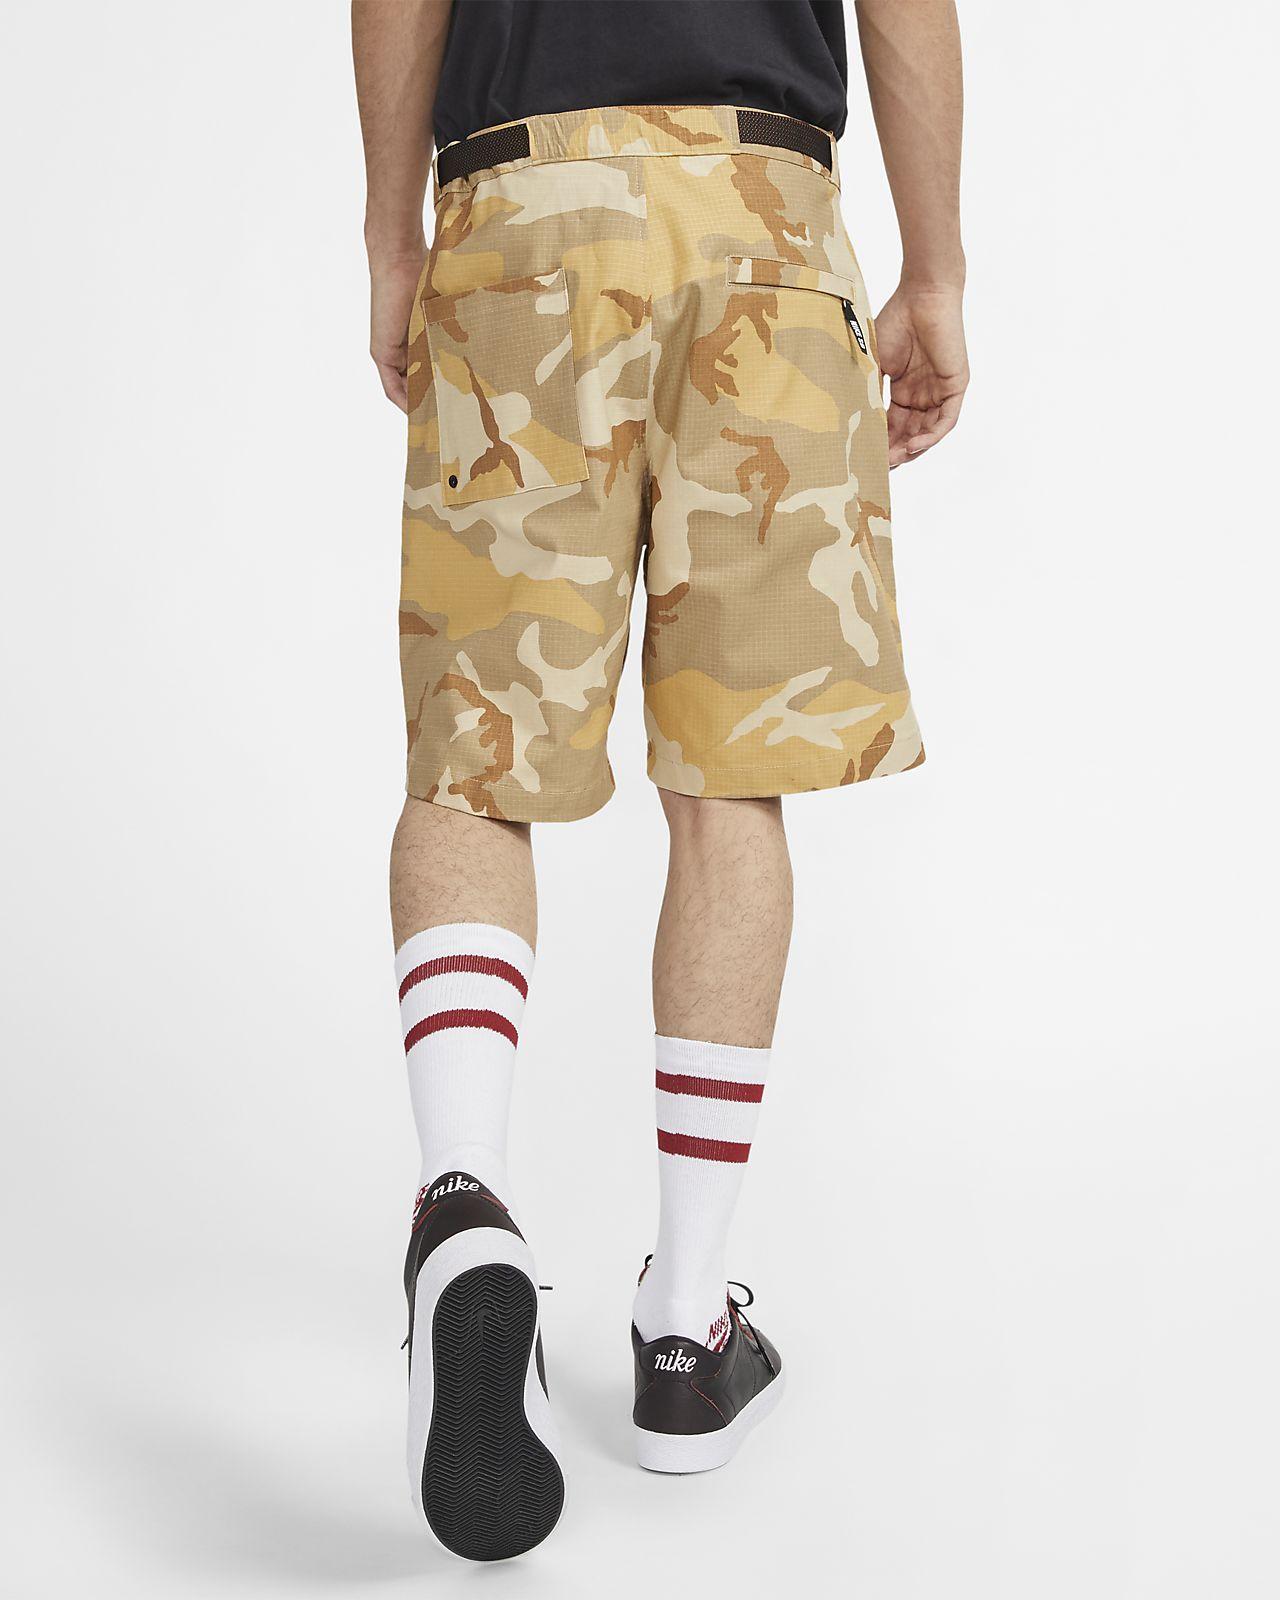 a2d2f6f5b6 Nike SB Men's Camo Skate Shorts. Nike.com GB